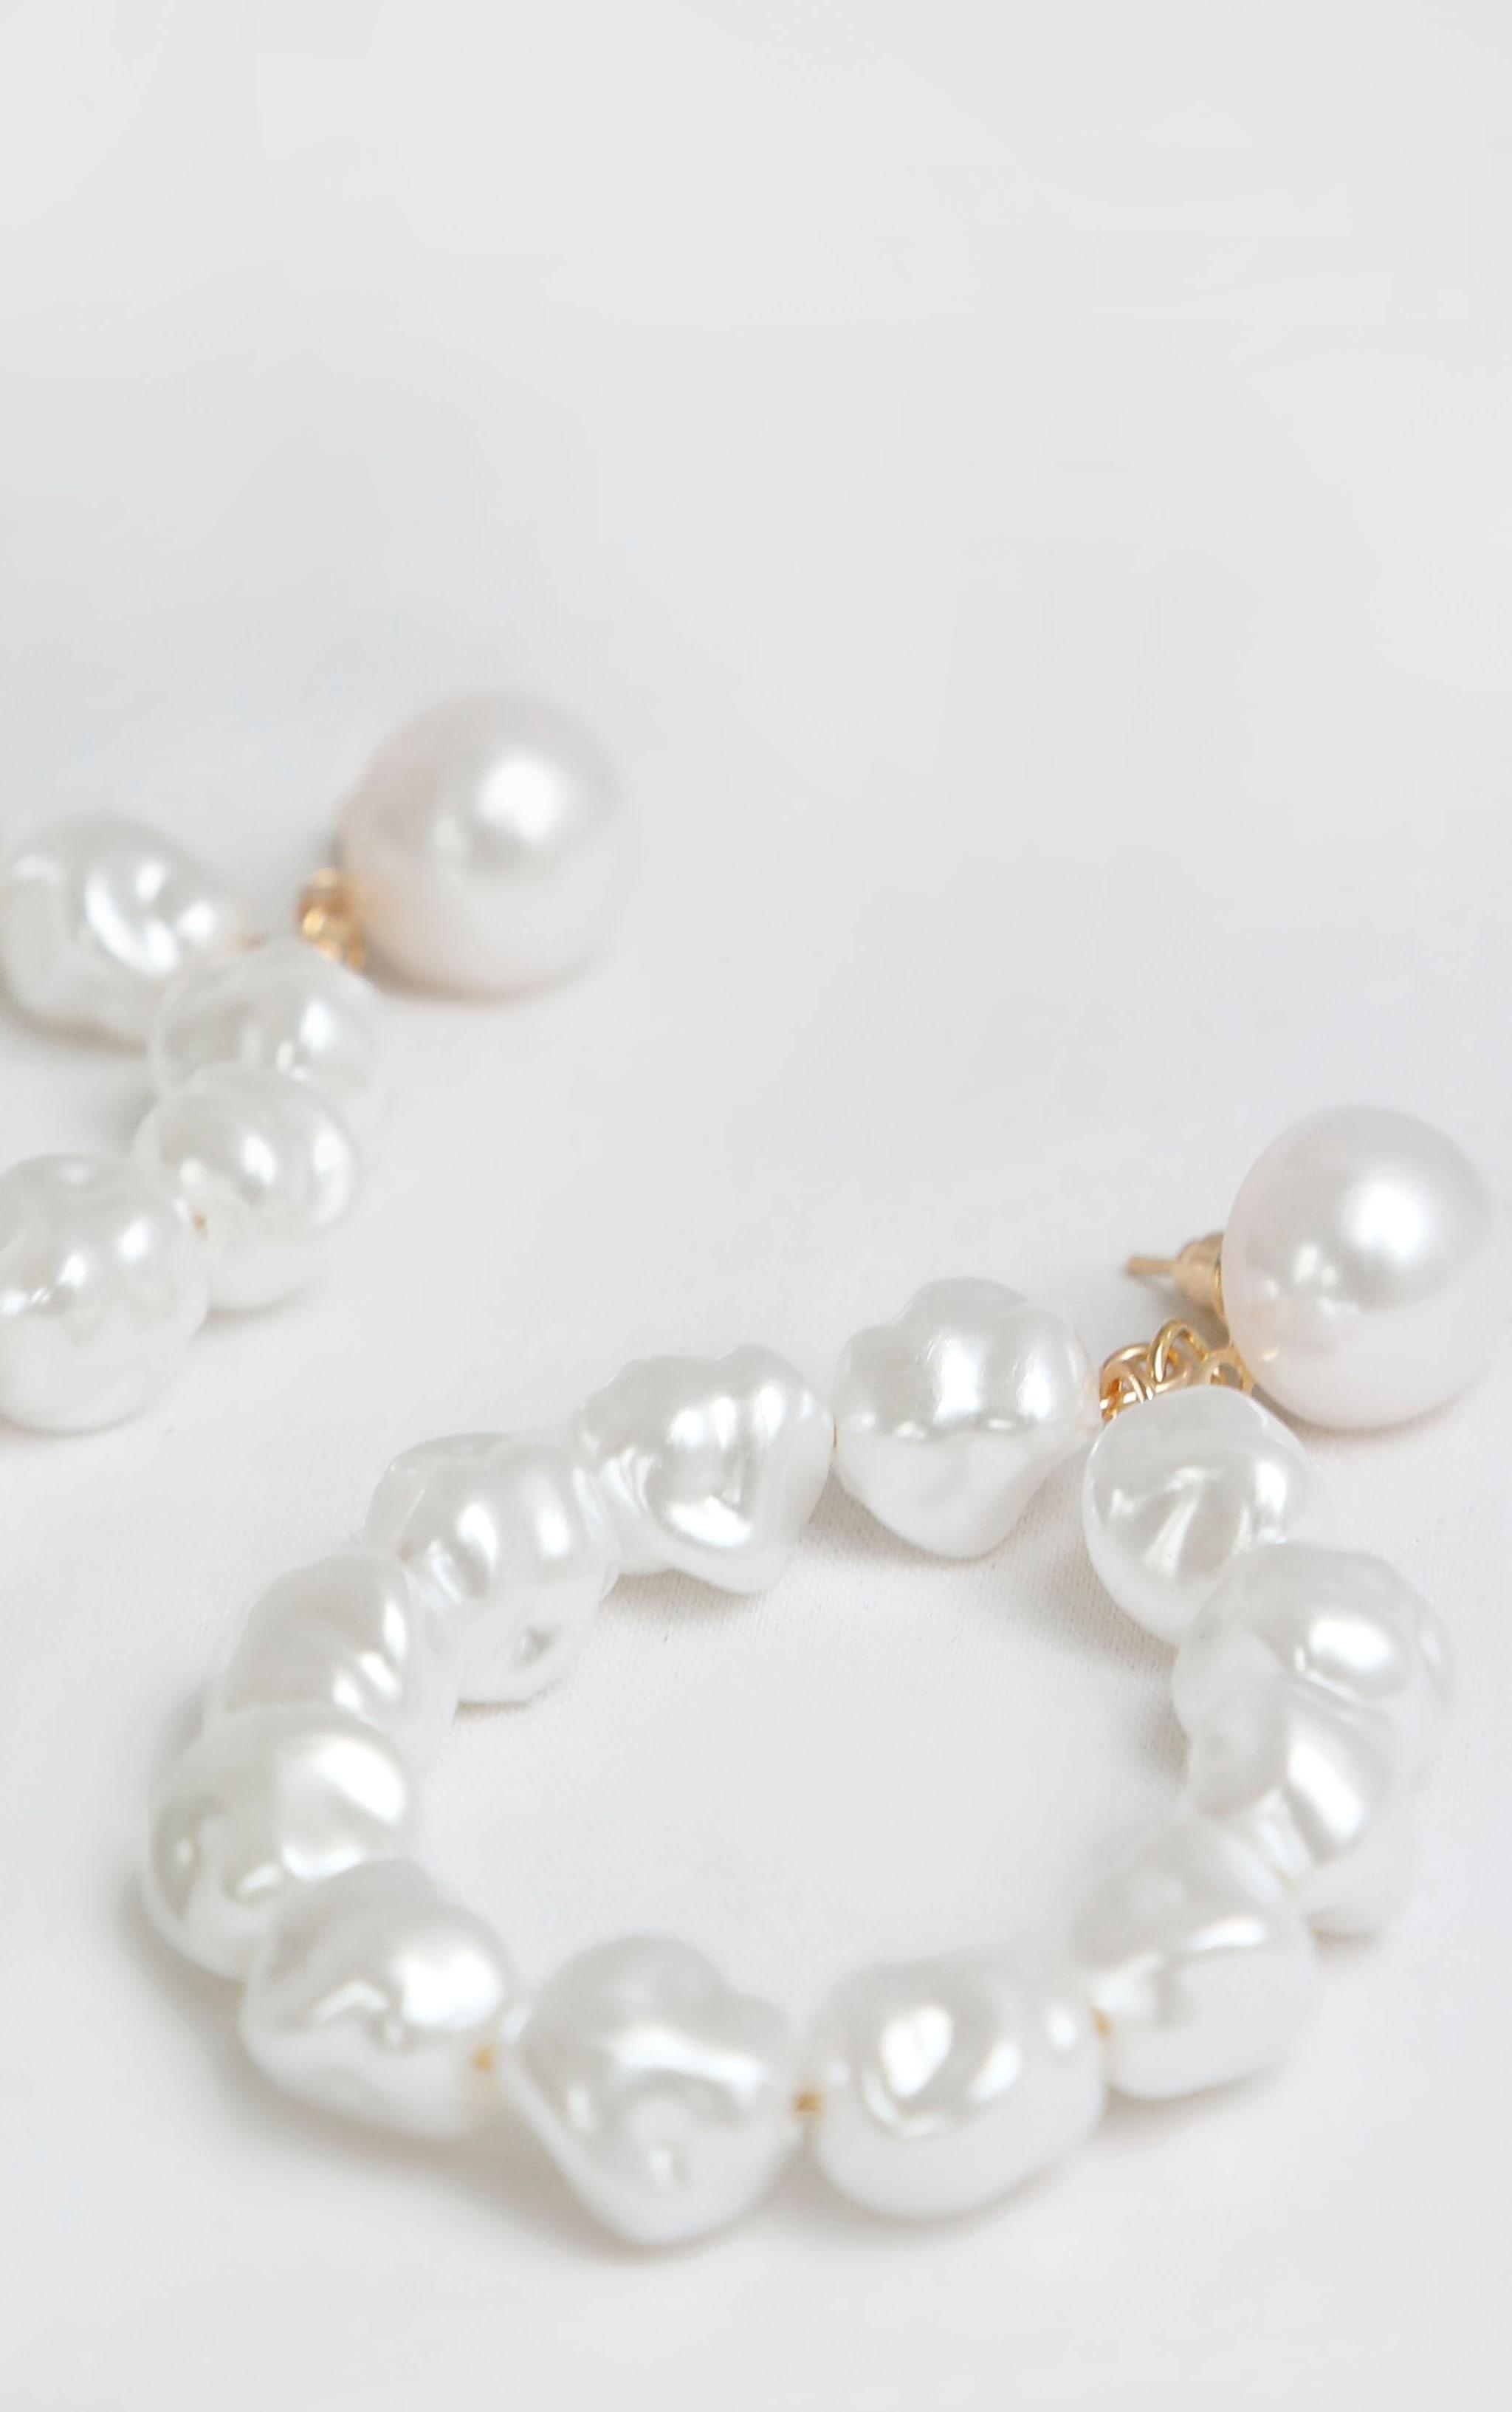 White Pearl Door Knocker Earrings 1